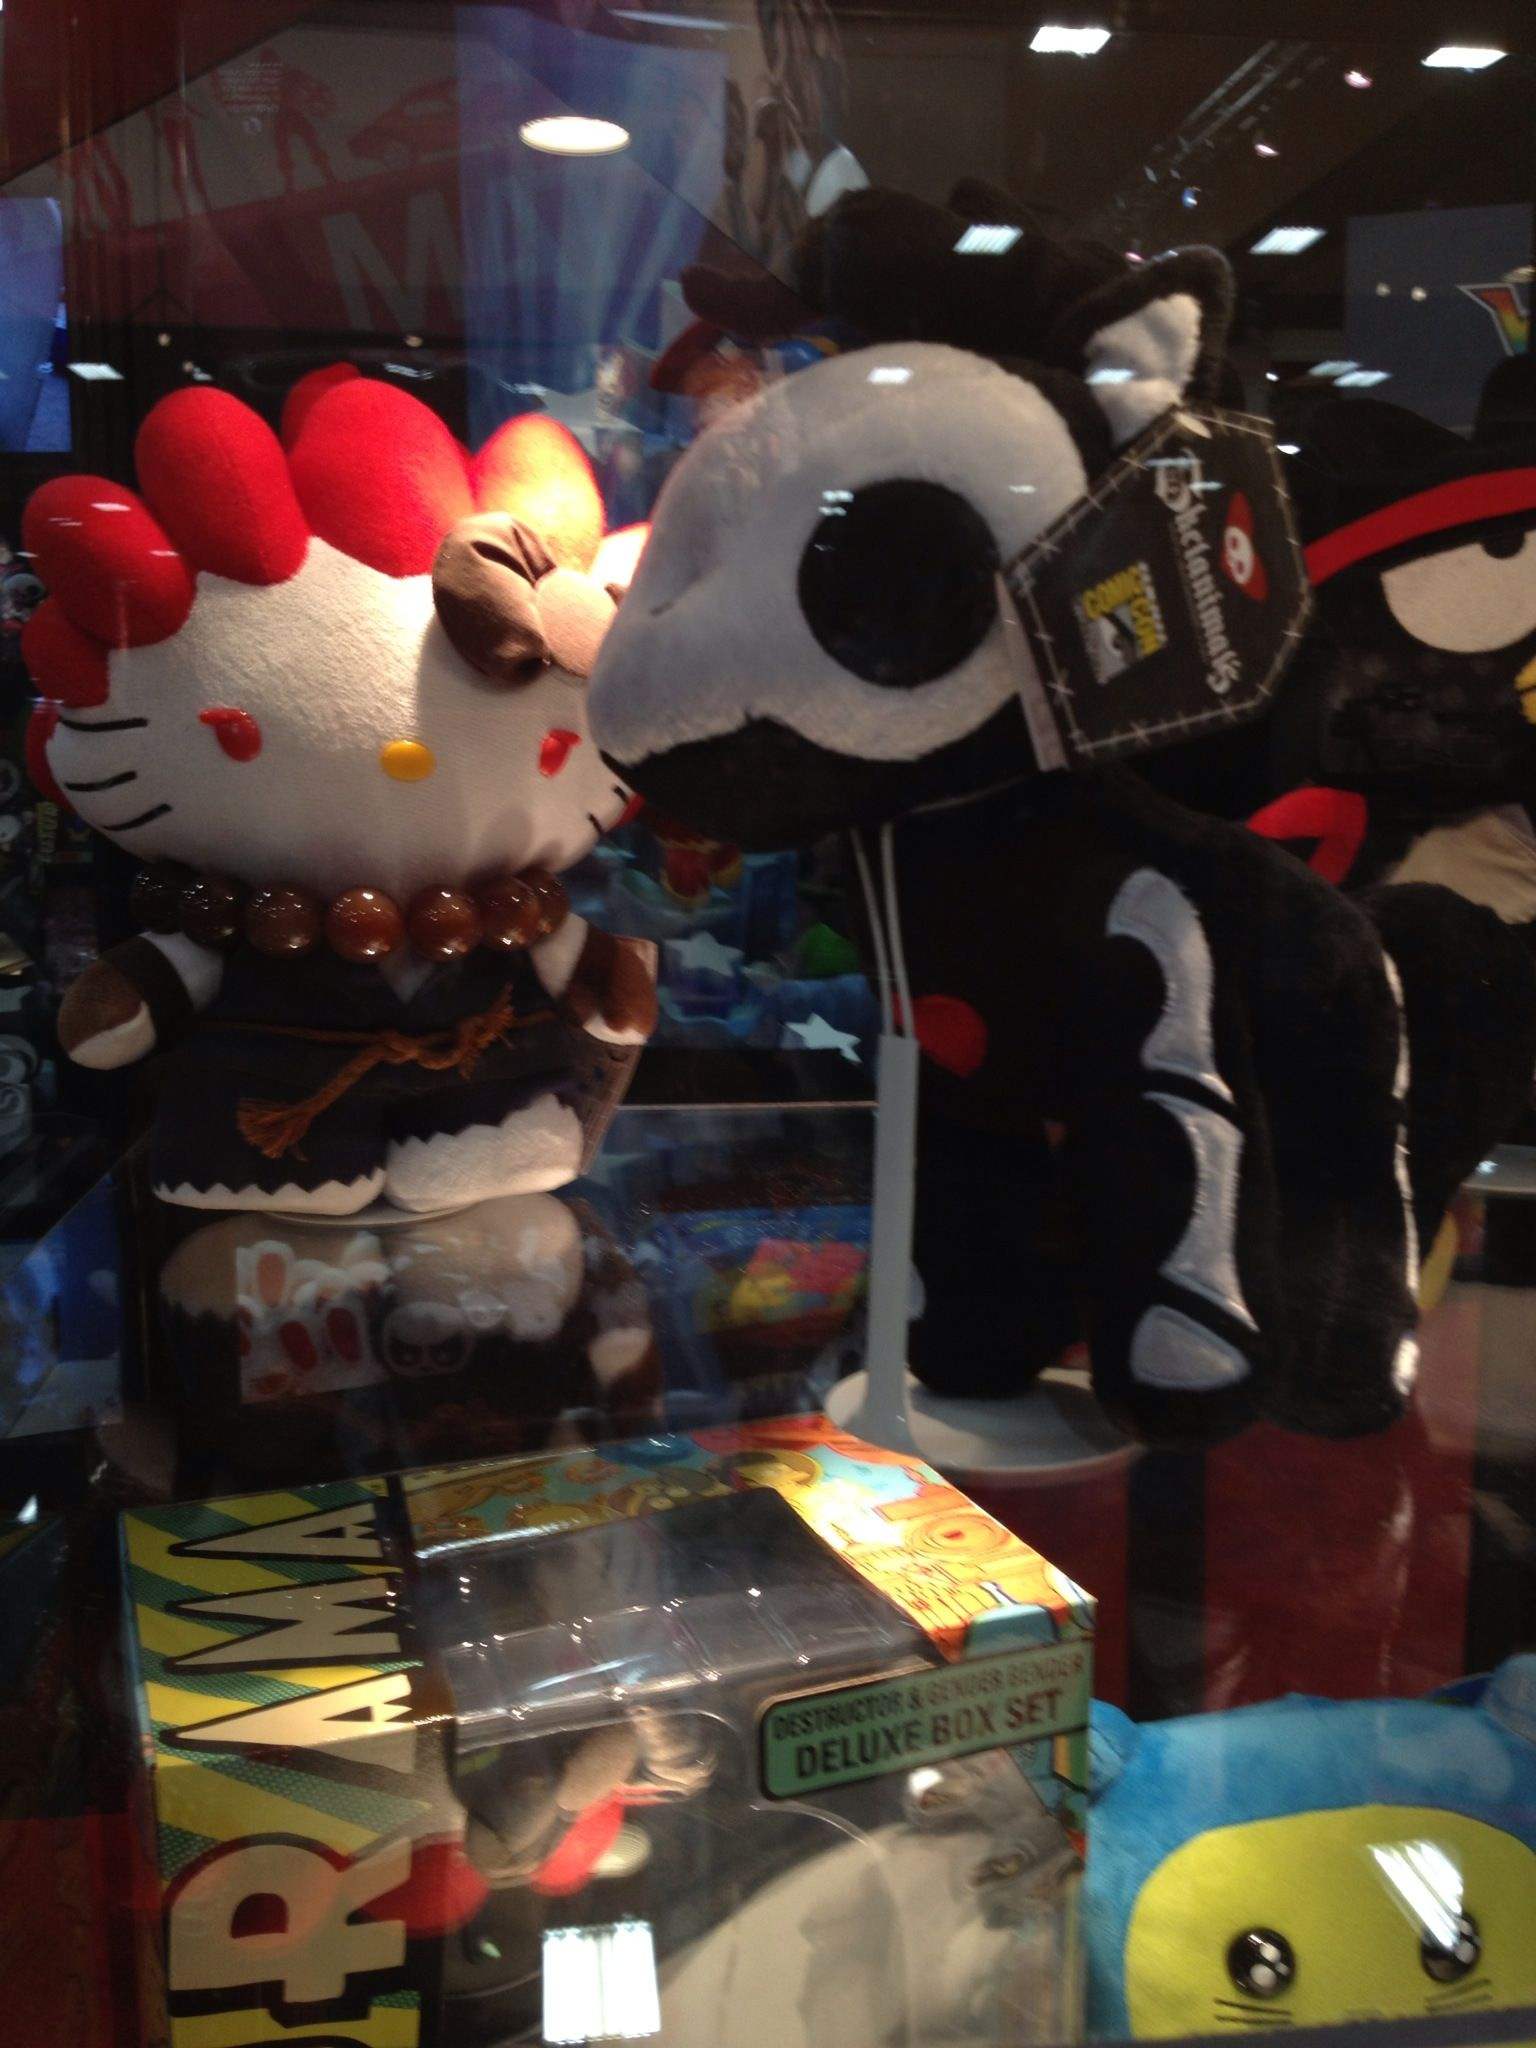 Comic Con 2013 Exclusives: Ryu Badtz Maru, Shin Akuma Hello Kitty (Street Fighter), and Skelanimals